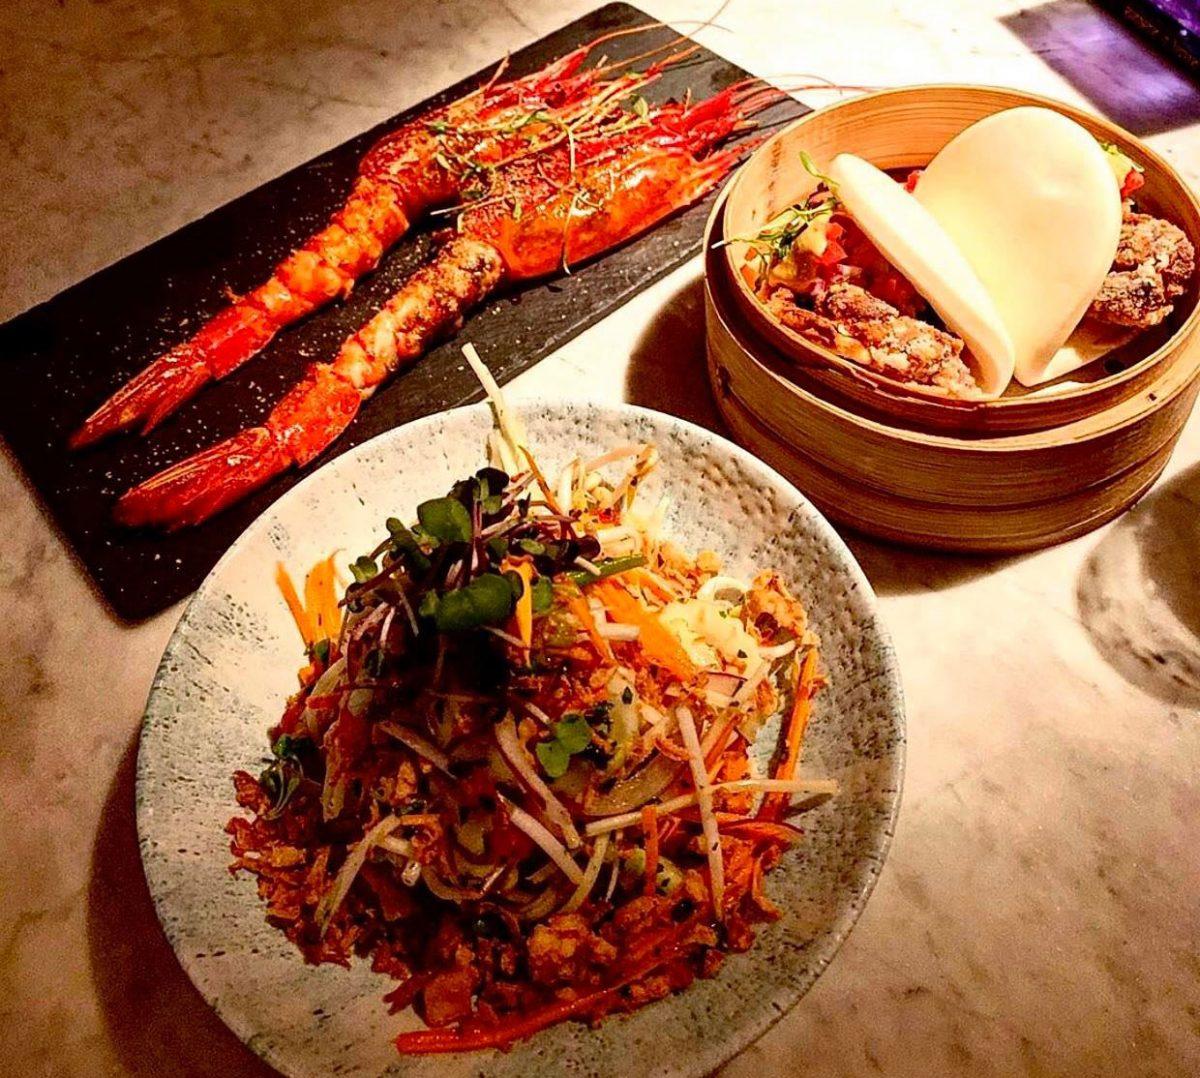 restaurante-bambuddha-ibiza-welcometoibiza